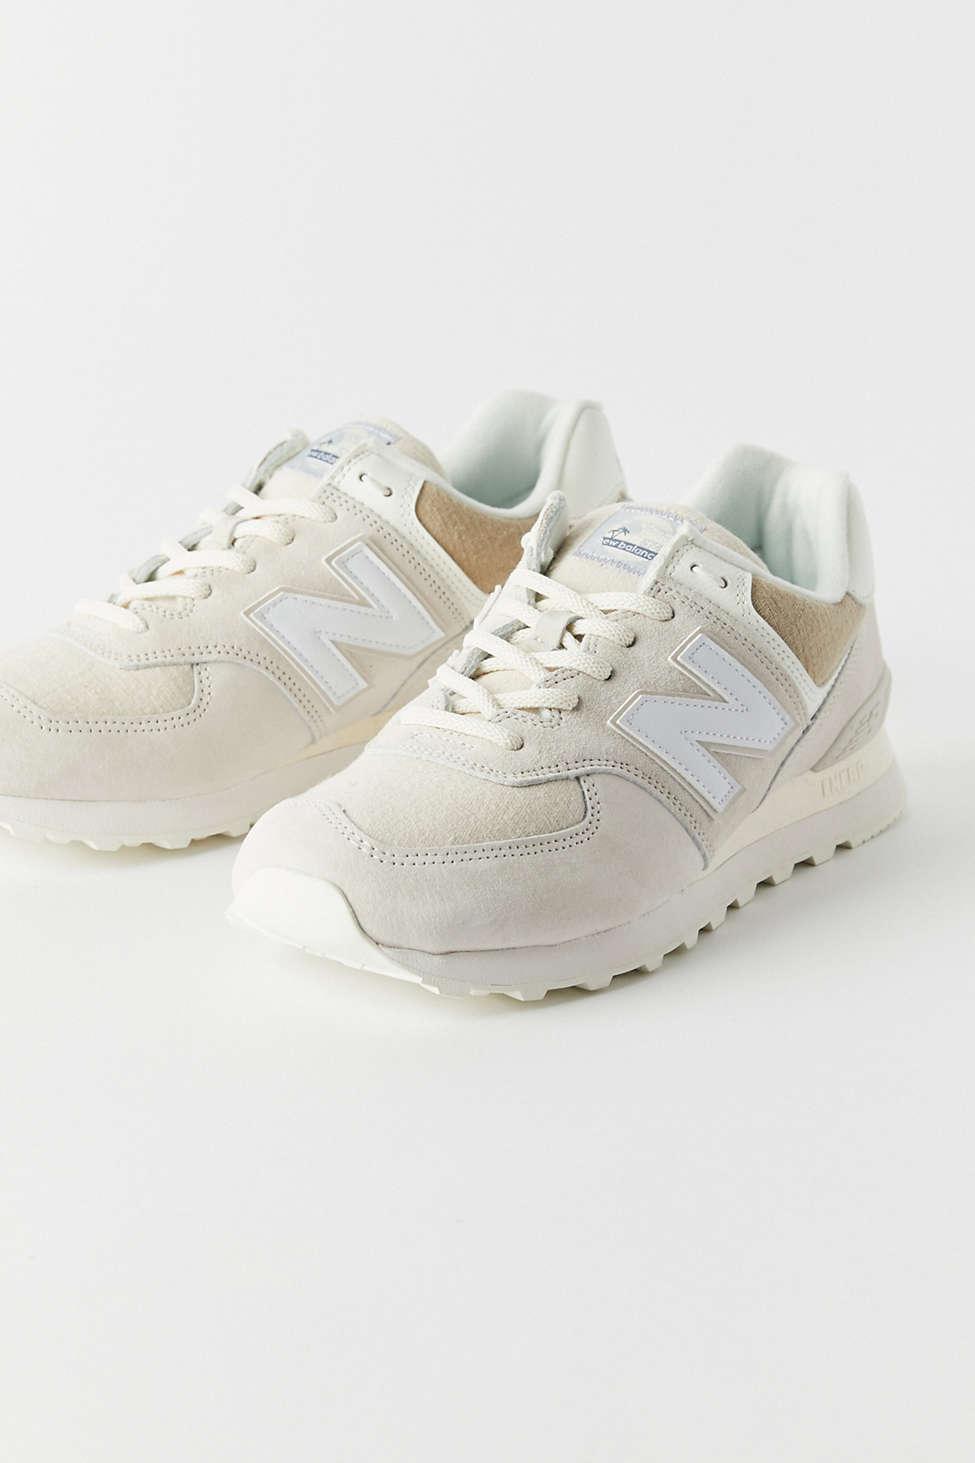 New Balance Suede 574 Summer Beach Sneaker in Grey (White) - Lyst